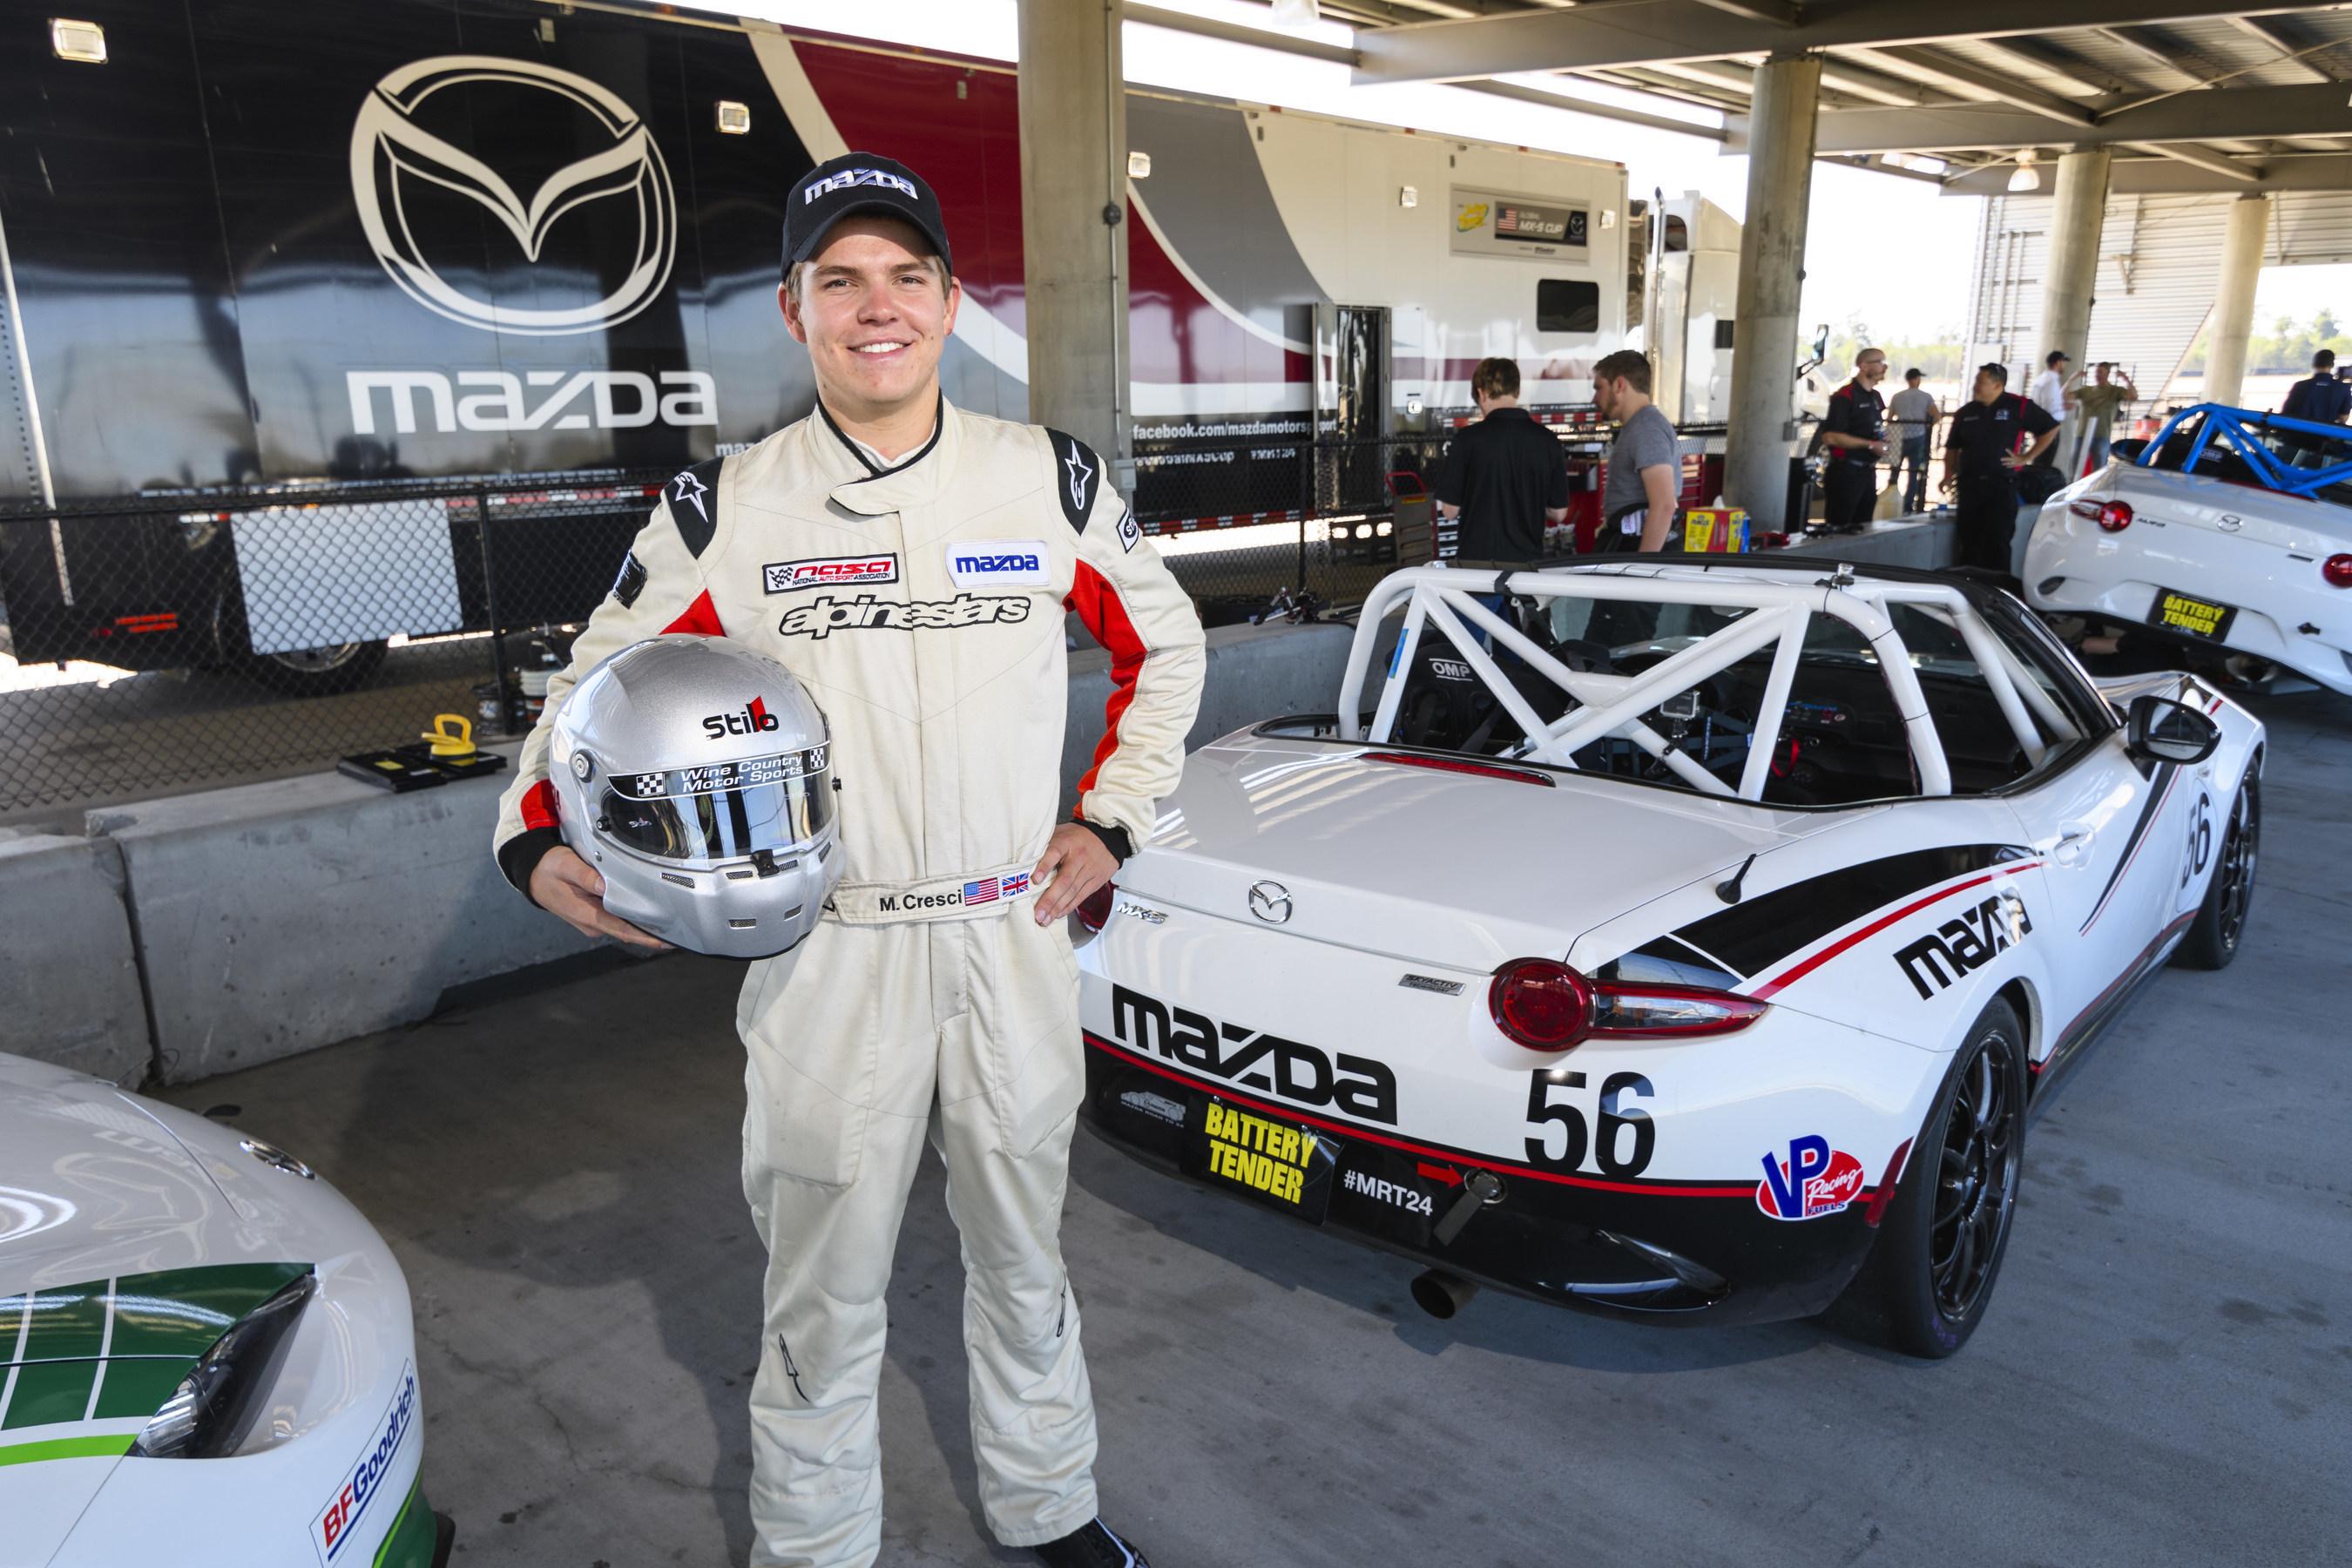 Matt Cresci Wins 2016 Mazda Road to 24 Shootout